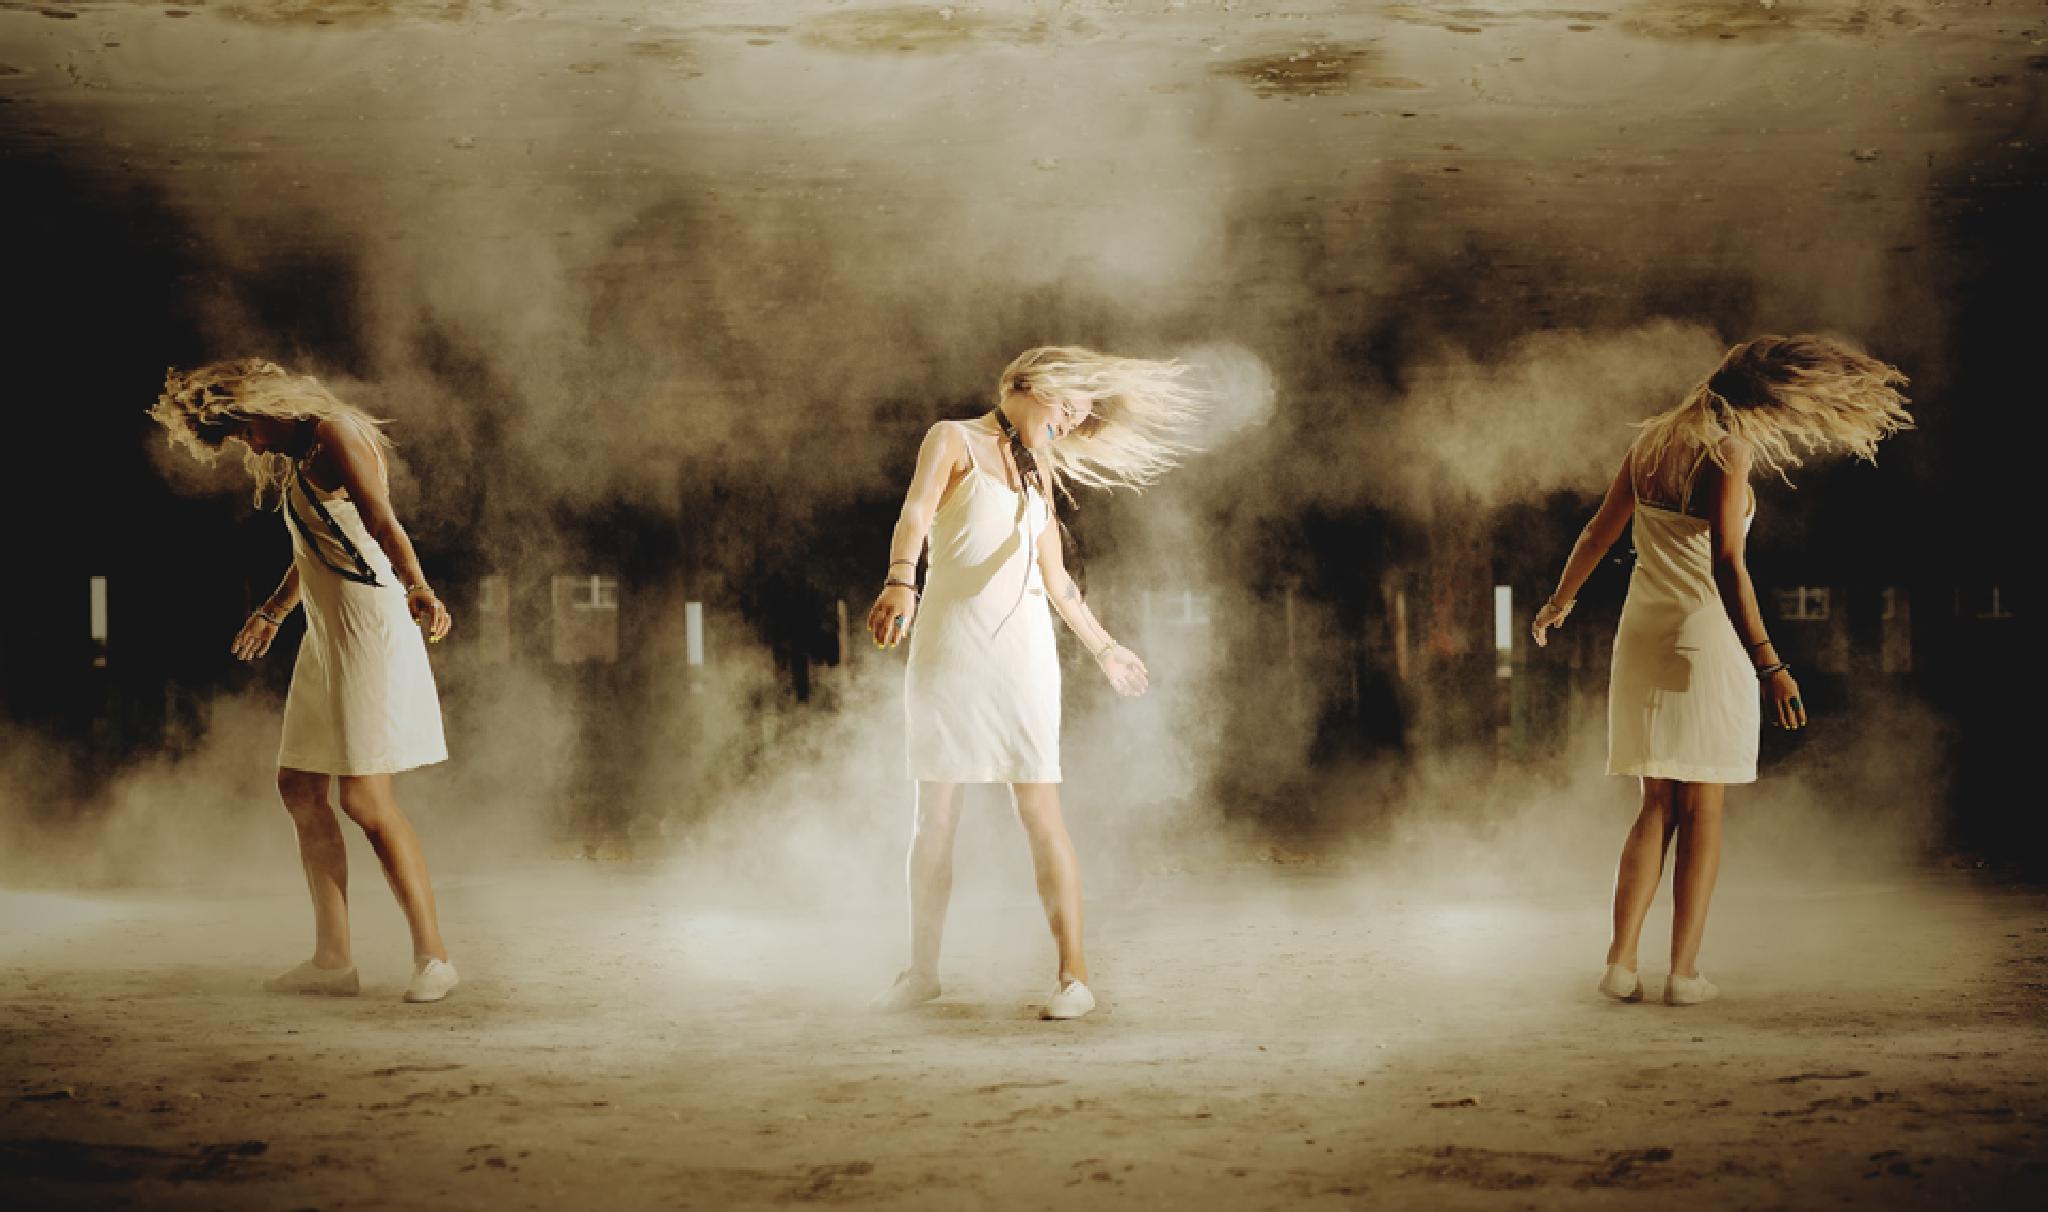 Bang your worries goodbye. by Adida Fallen Angel